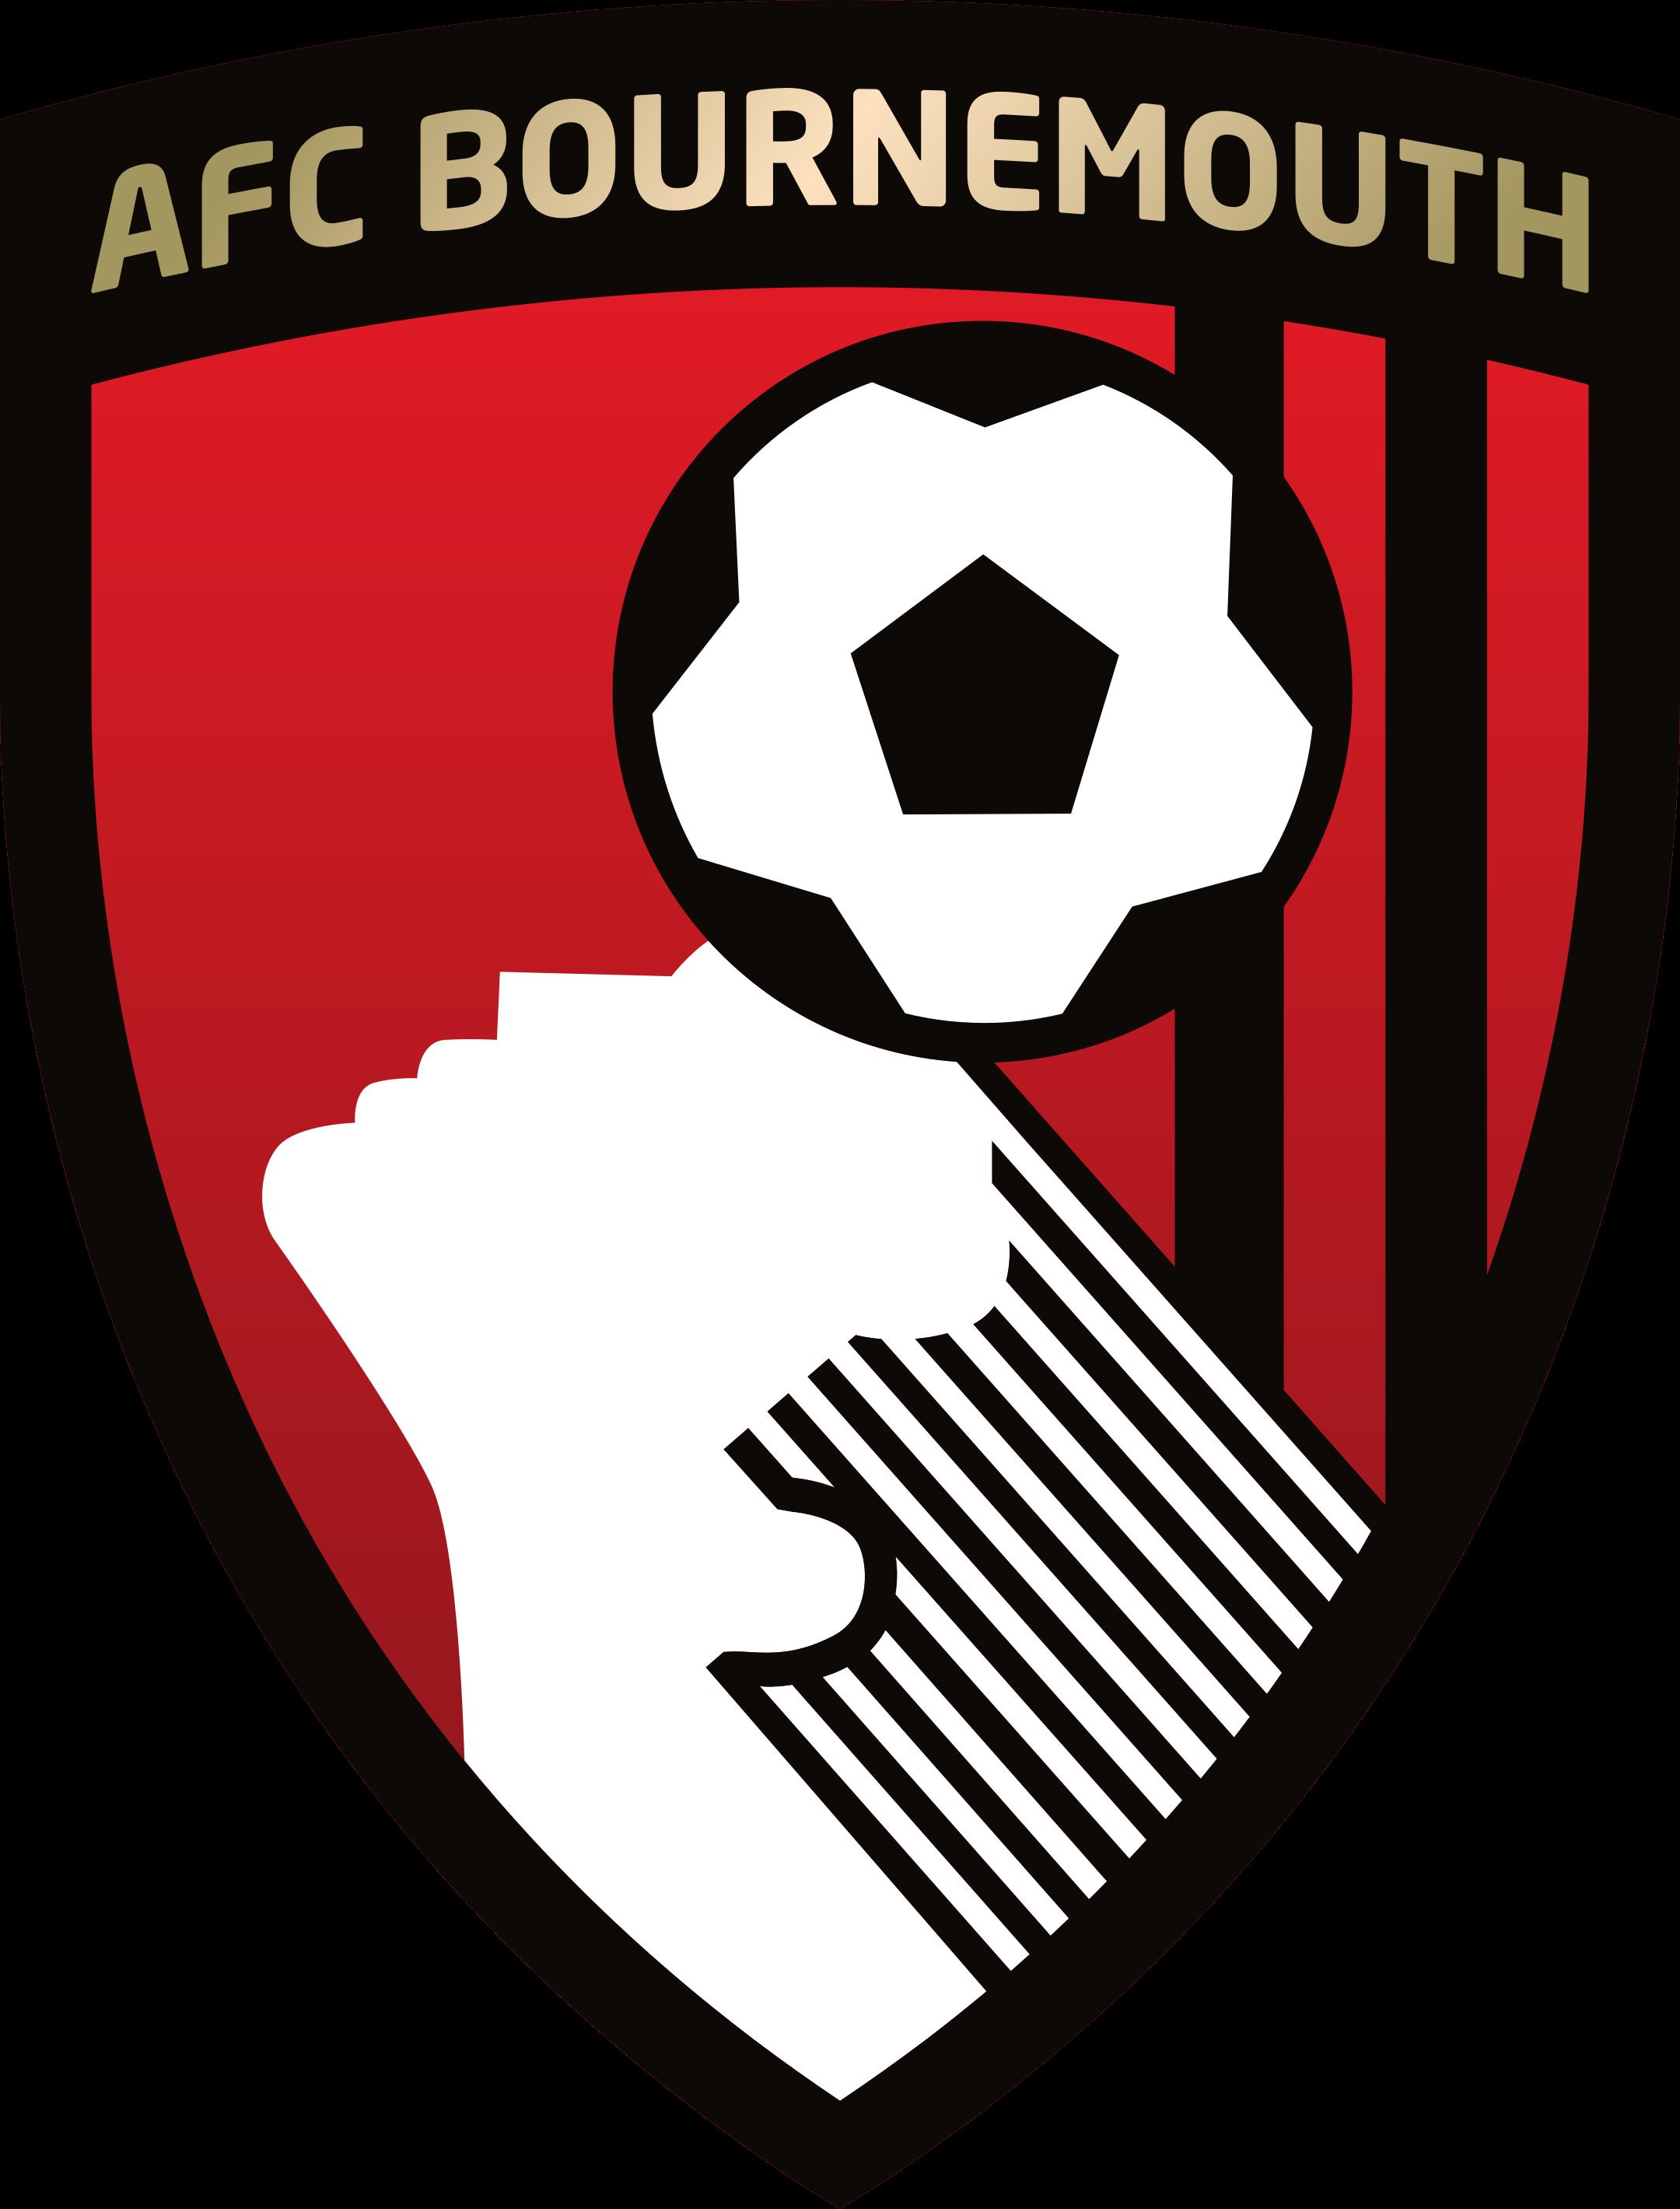 bournemouth fc logo 1 - AFC Bournemouth Logo